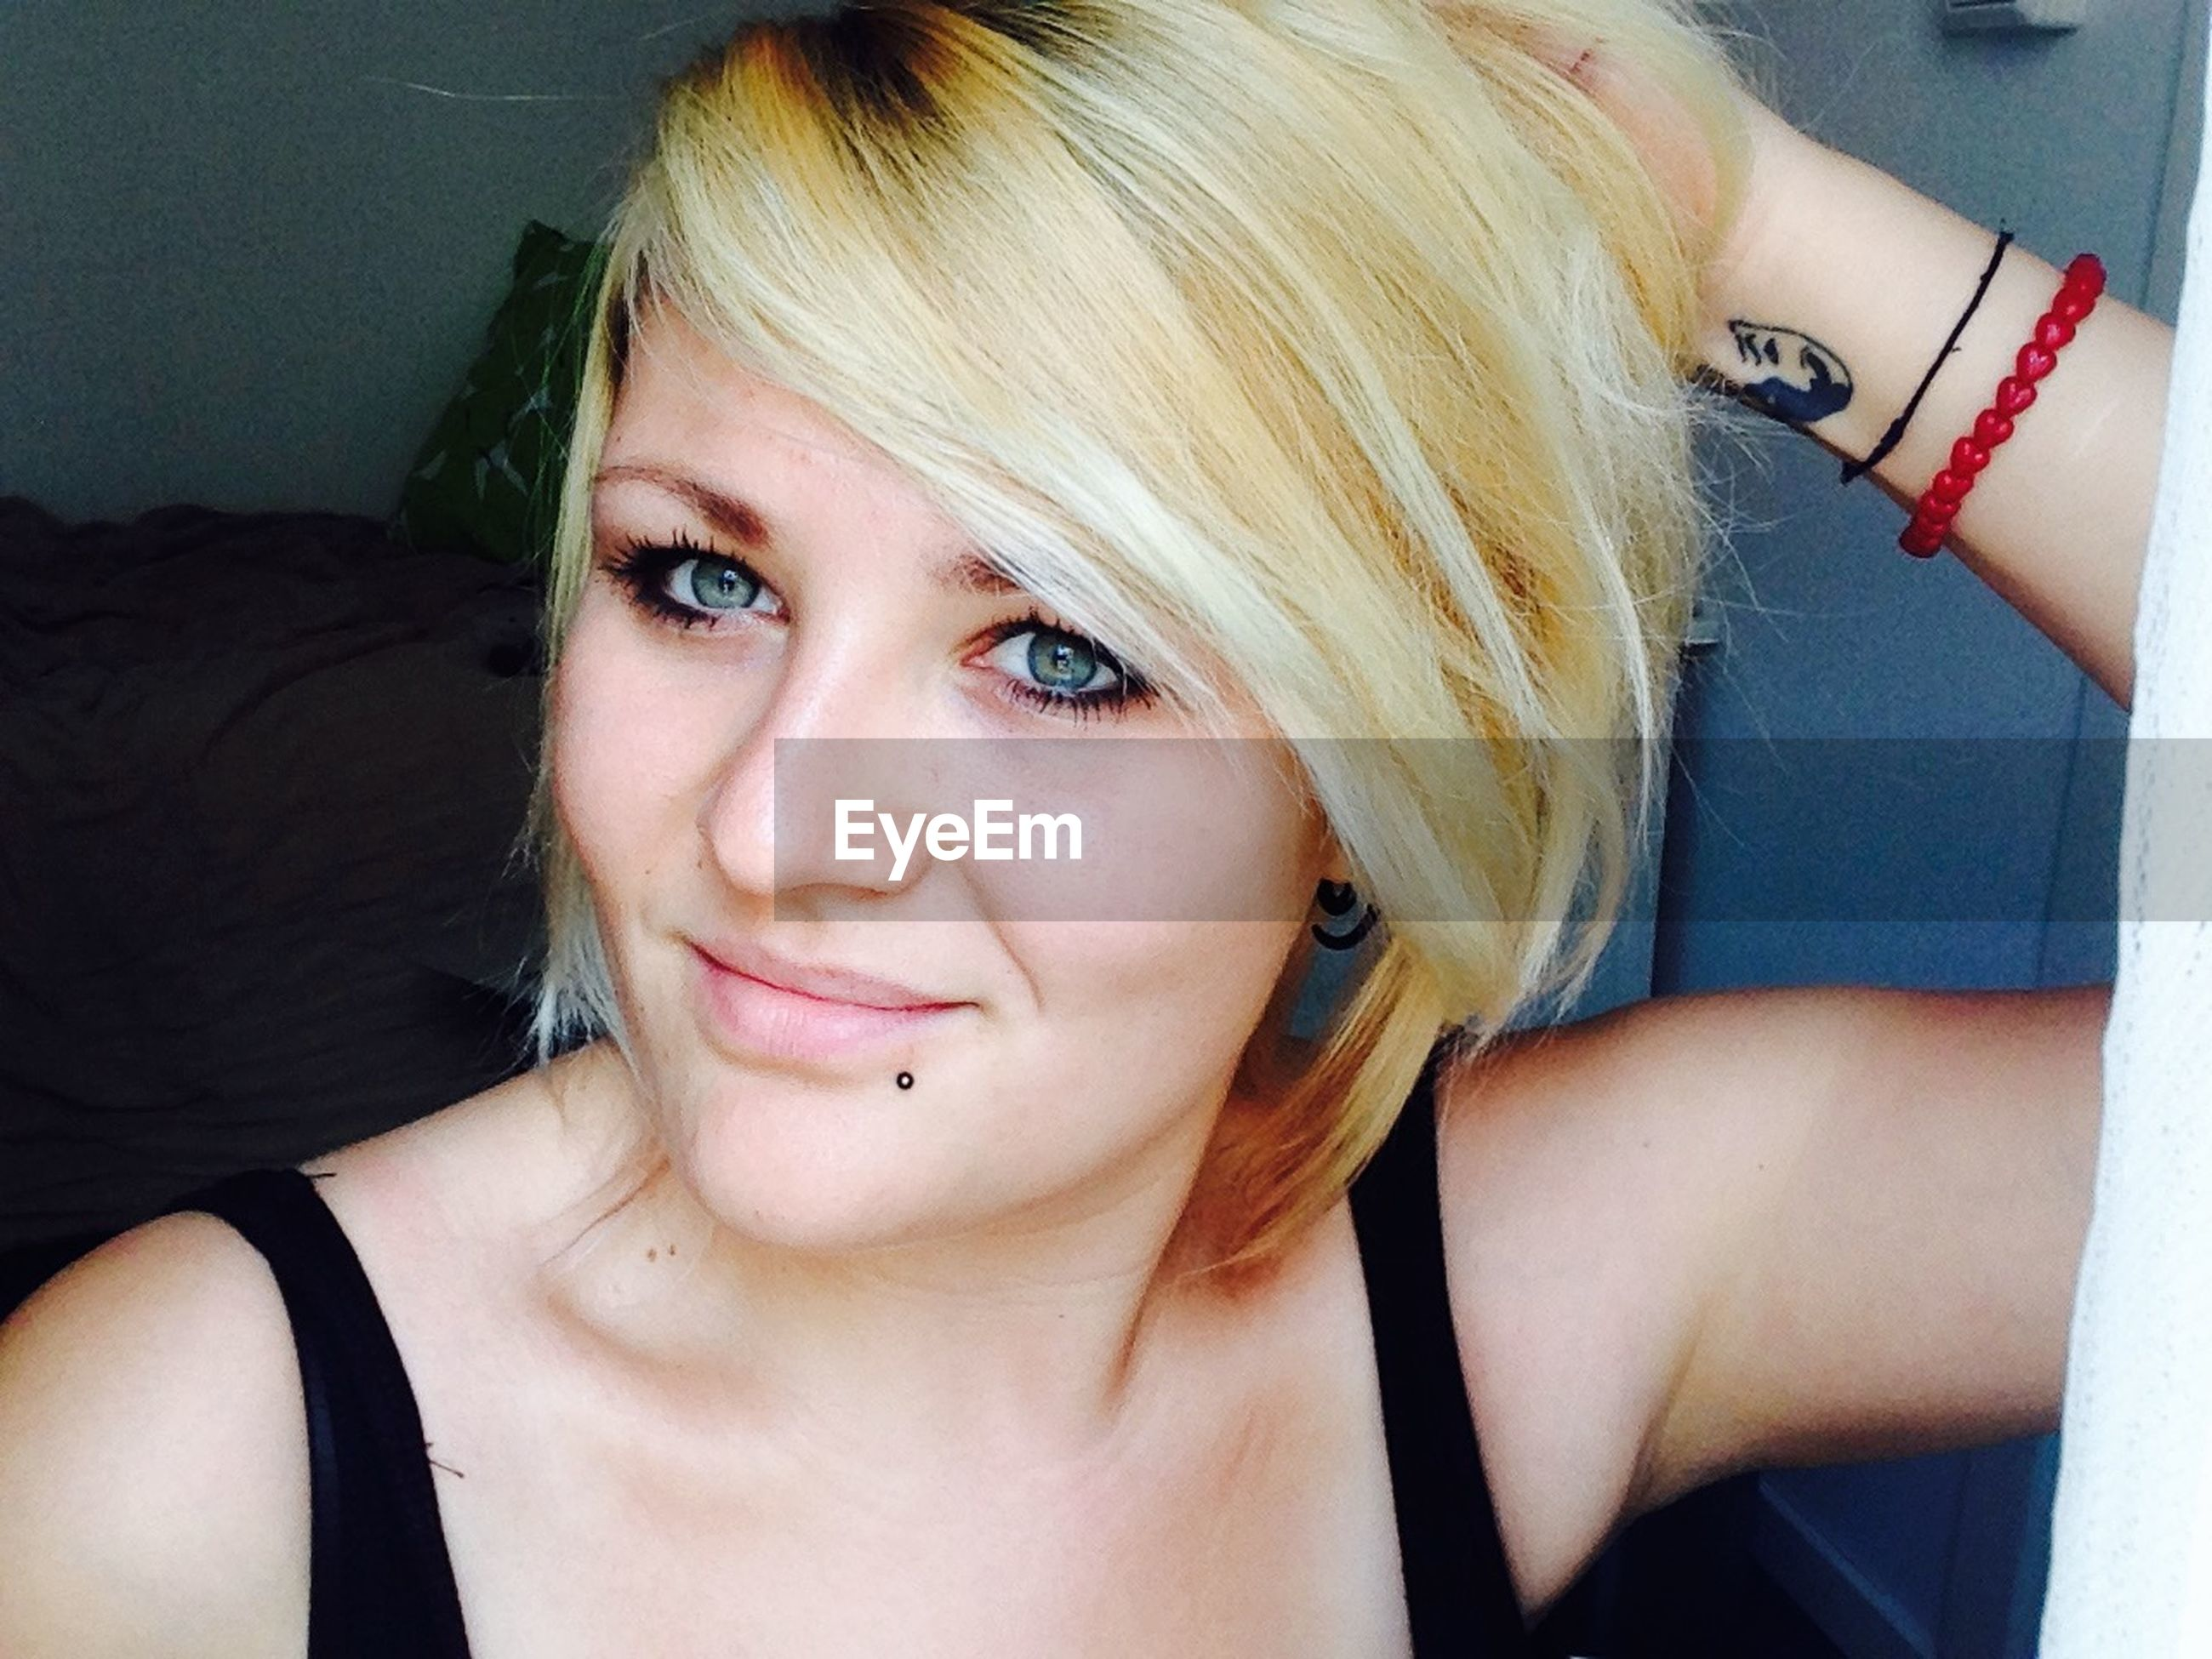 Kayden Kross washed her body